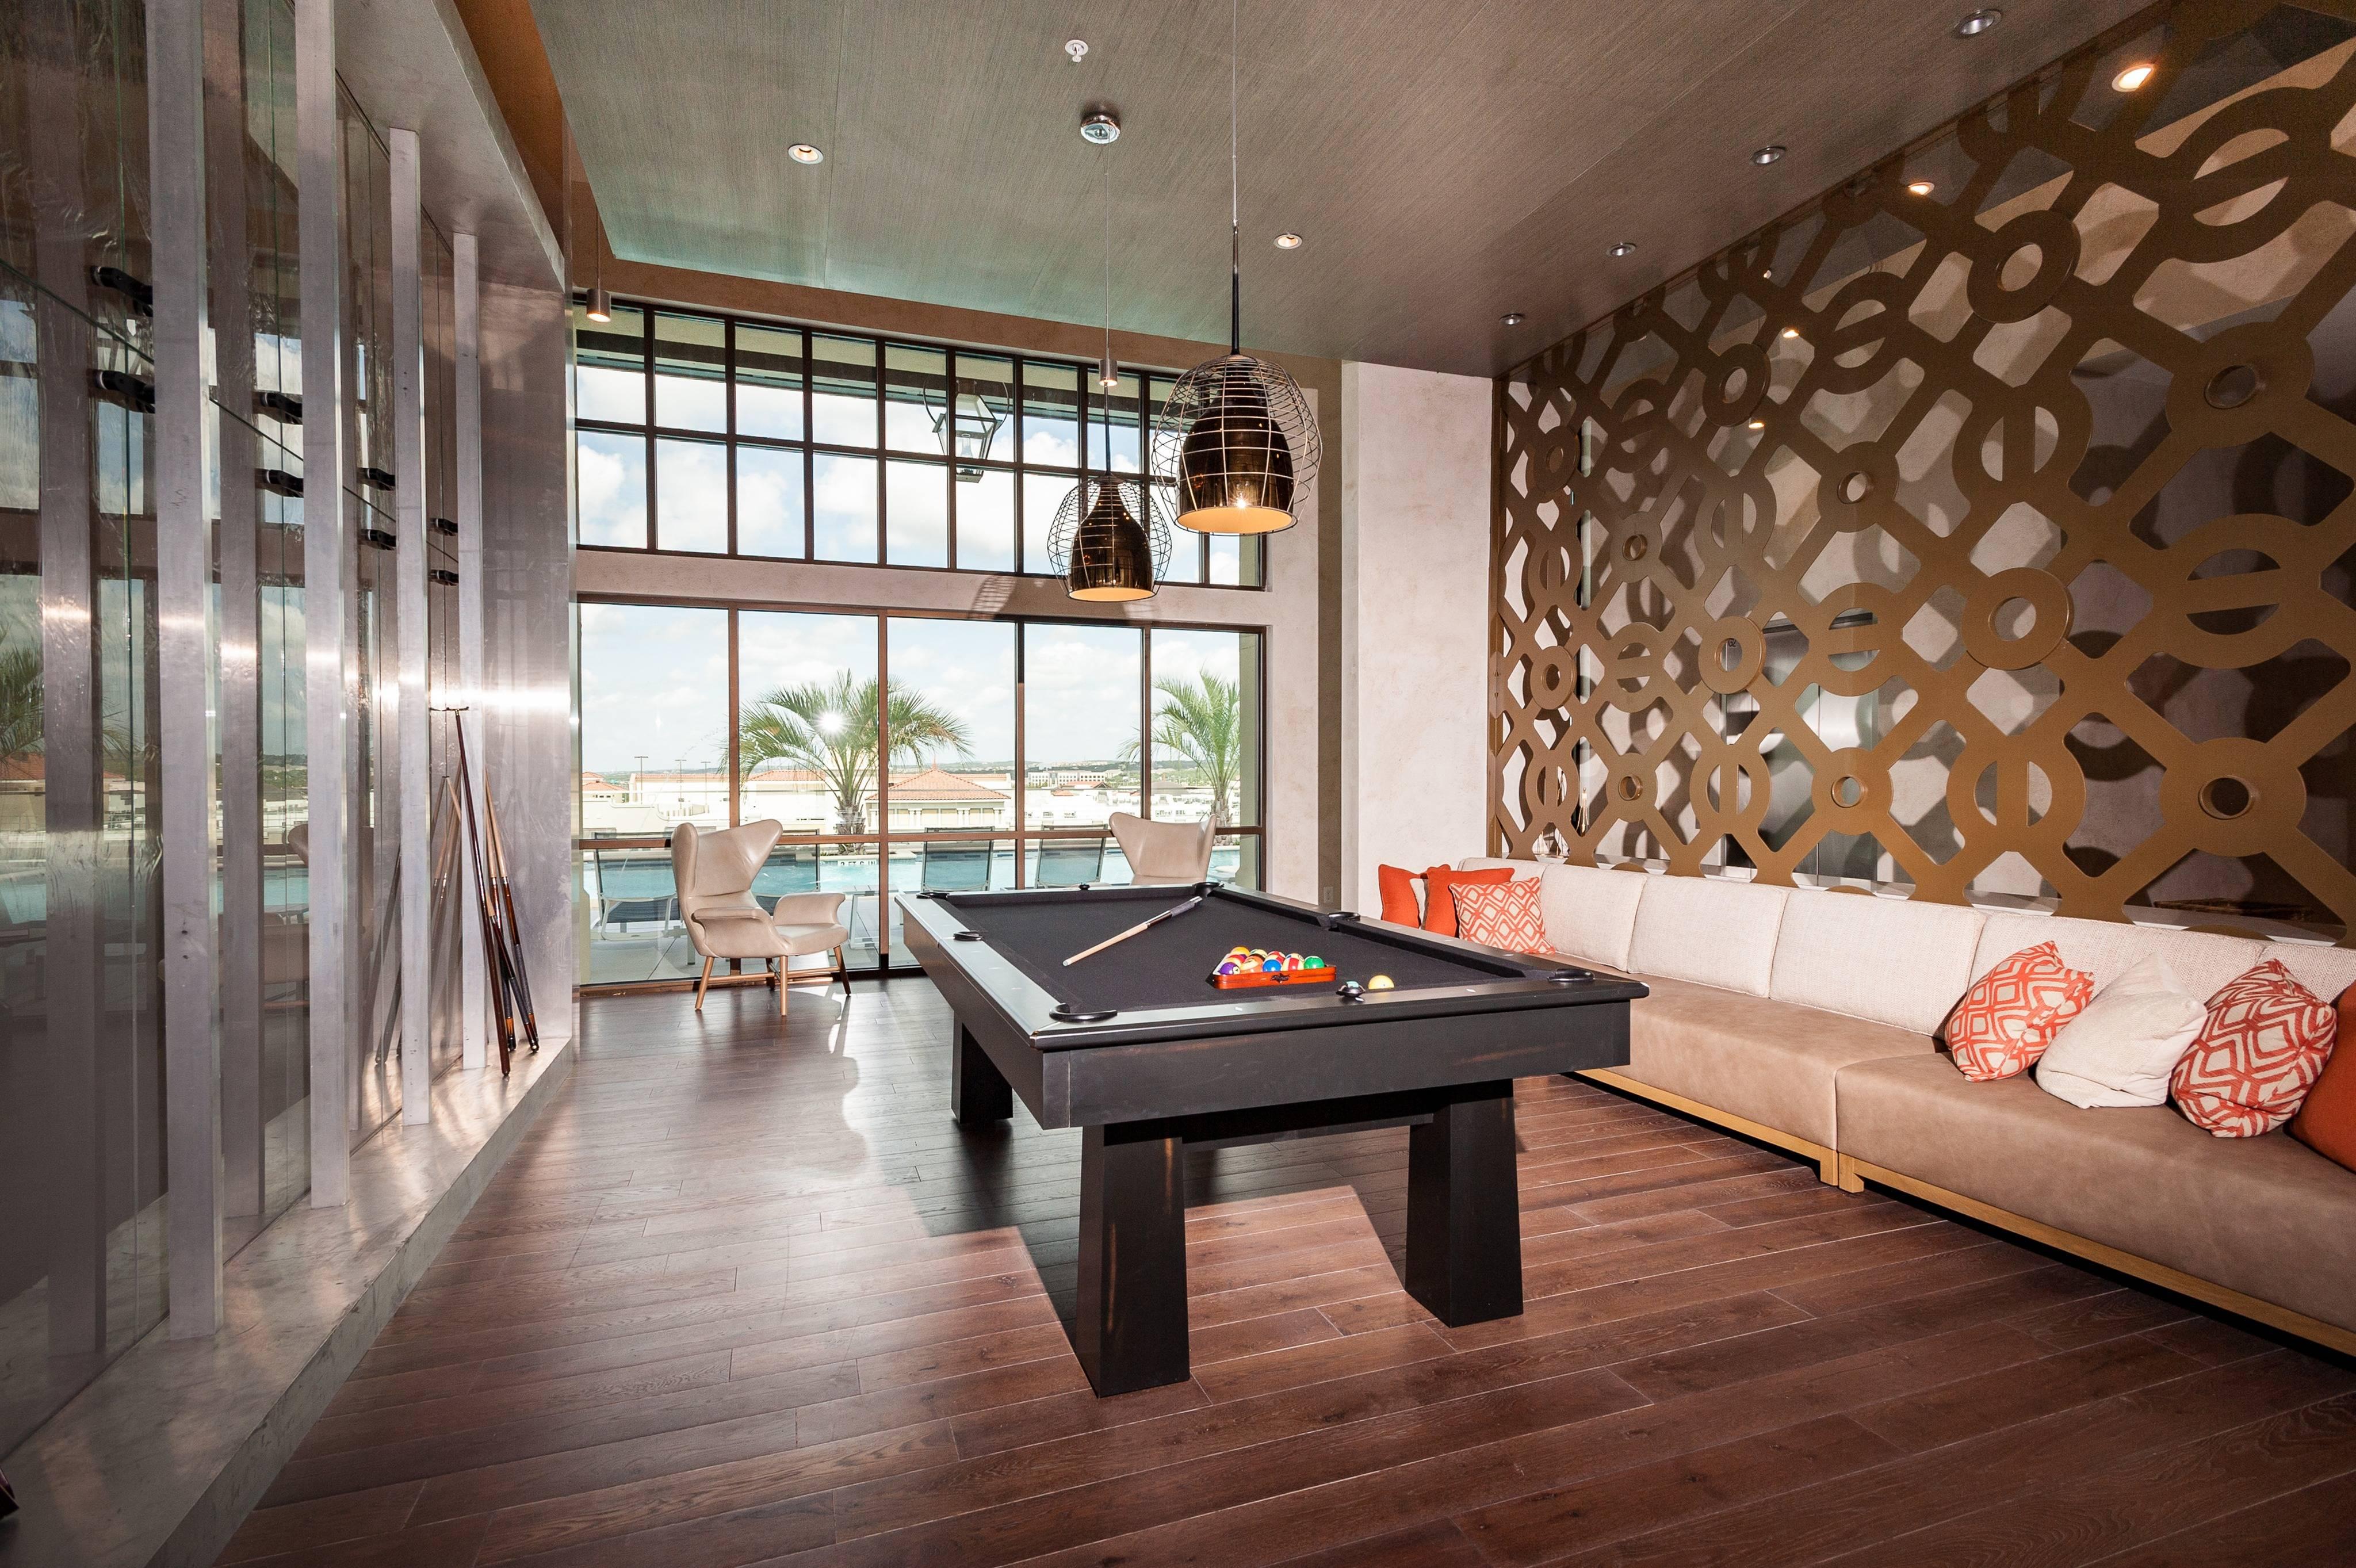 Social Room | Gourmet Kitchen | Billiards Table